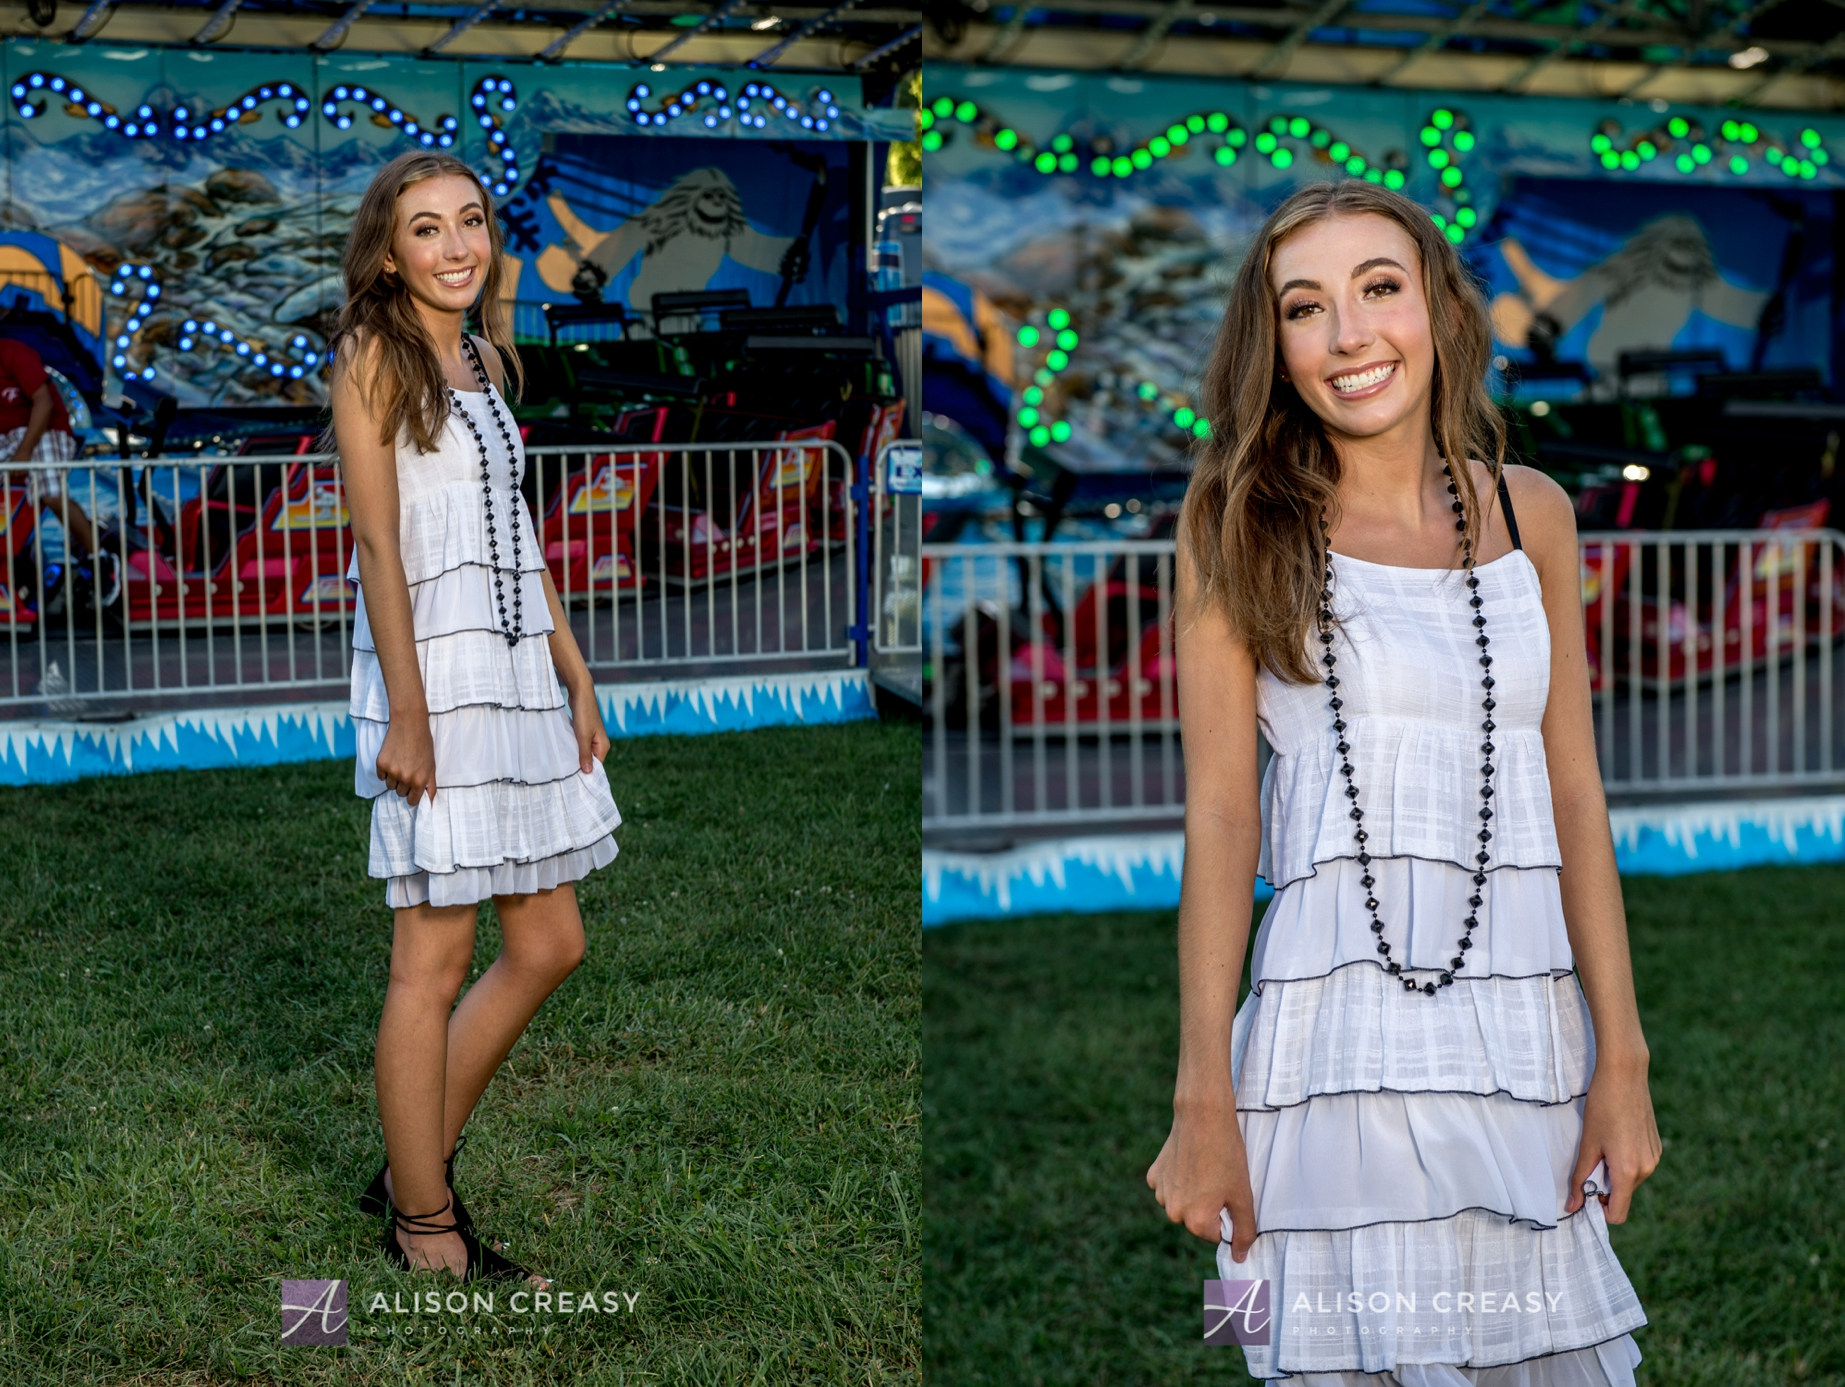 Alison-Creasy-Photography-Lynchburg-VA-Senior- Photographer_0012.jpg